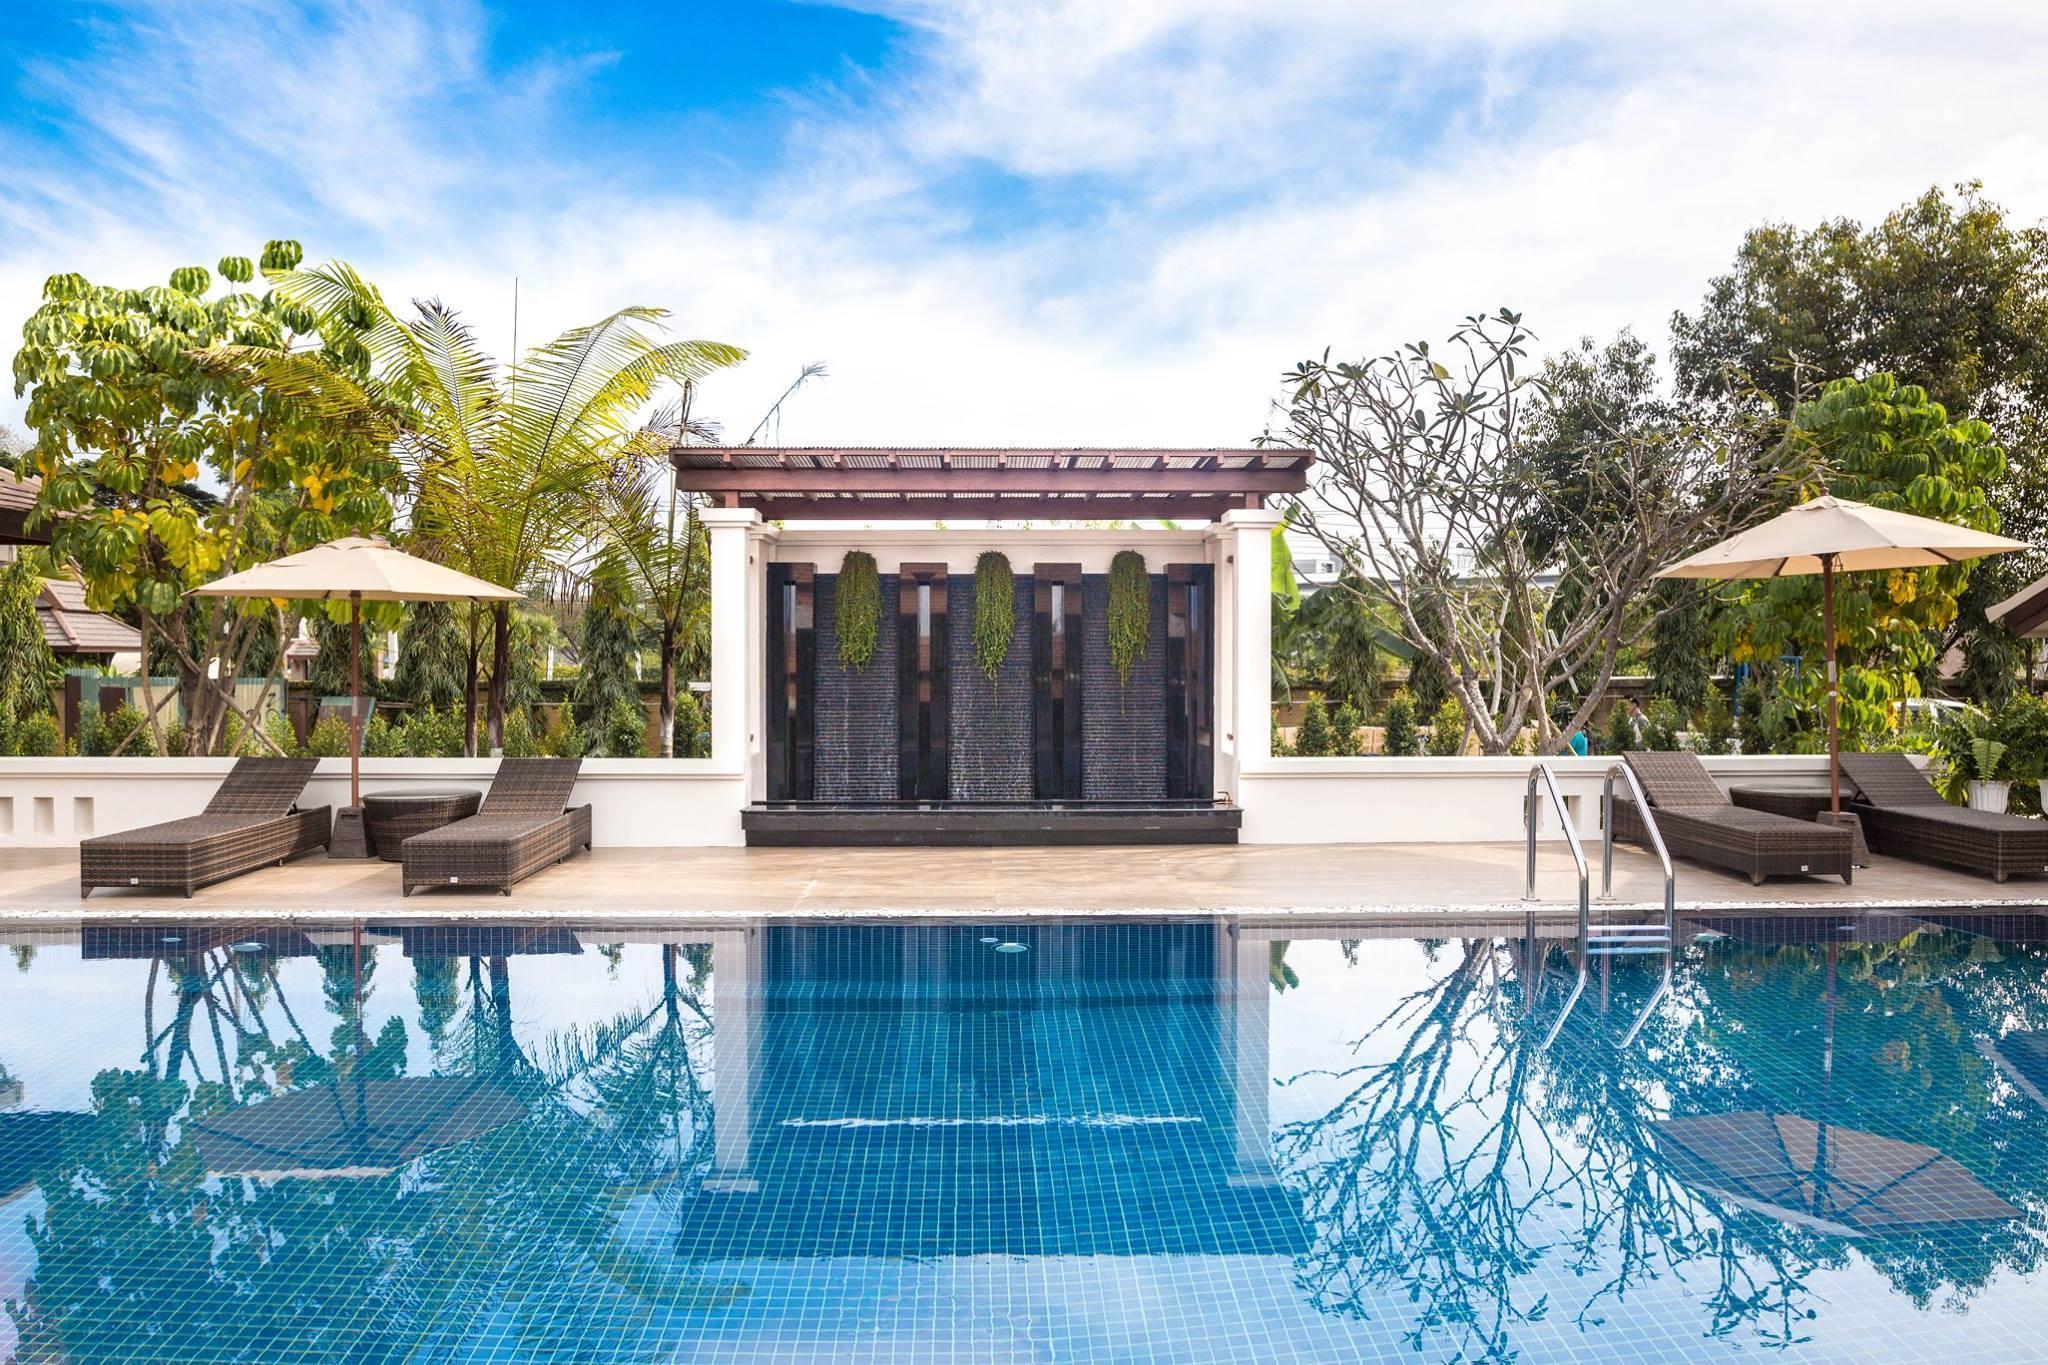 The Country Cosmo Villa 20BR w/ Pool & Breakfast วิลลา 20 ห้องนอน 20 ห้องน้ำส่วนตัว ขนาด 6400 ตร.ม. – หางดง